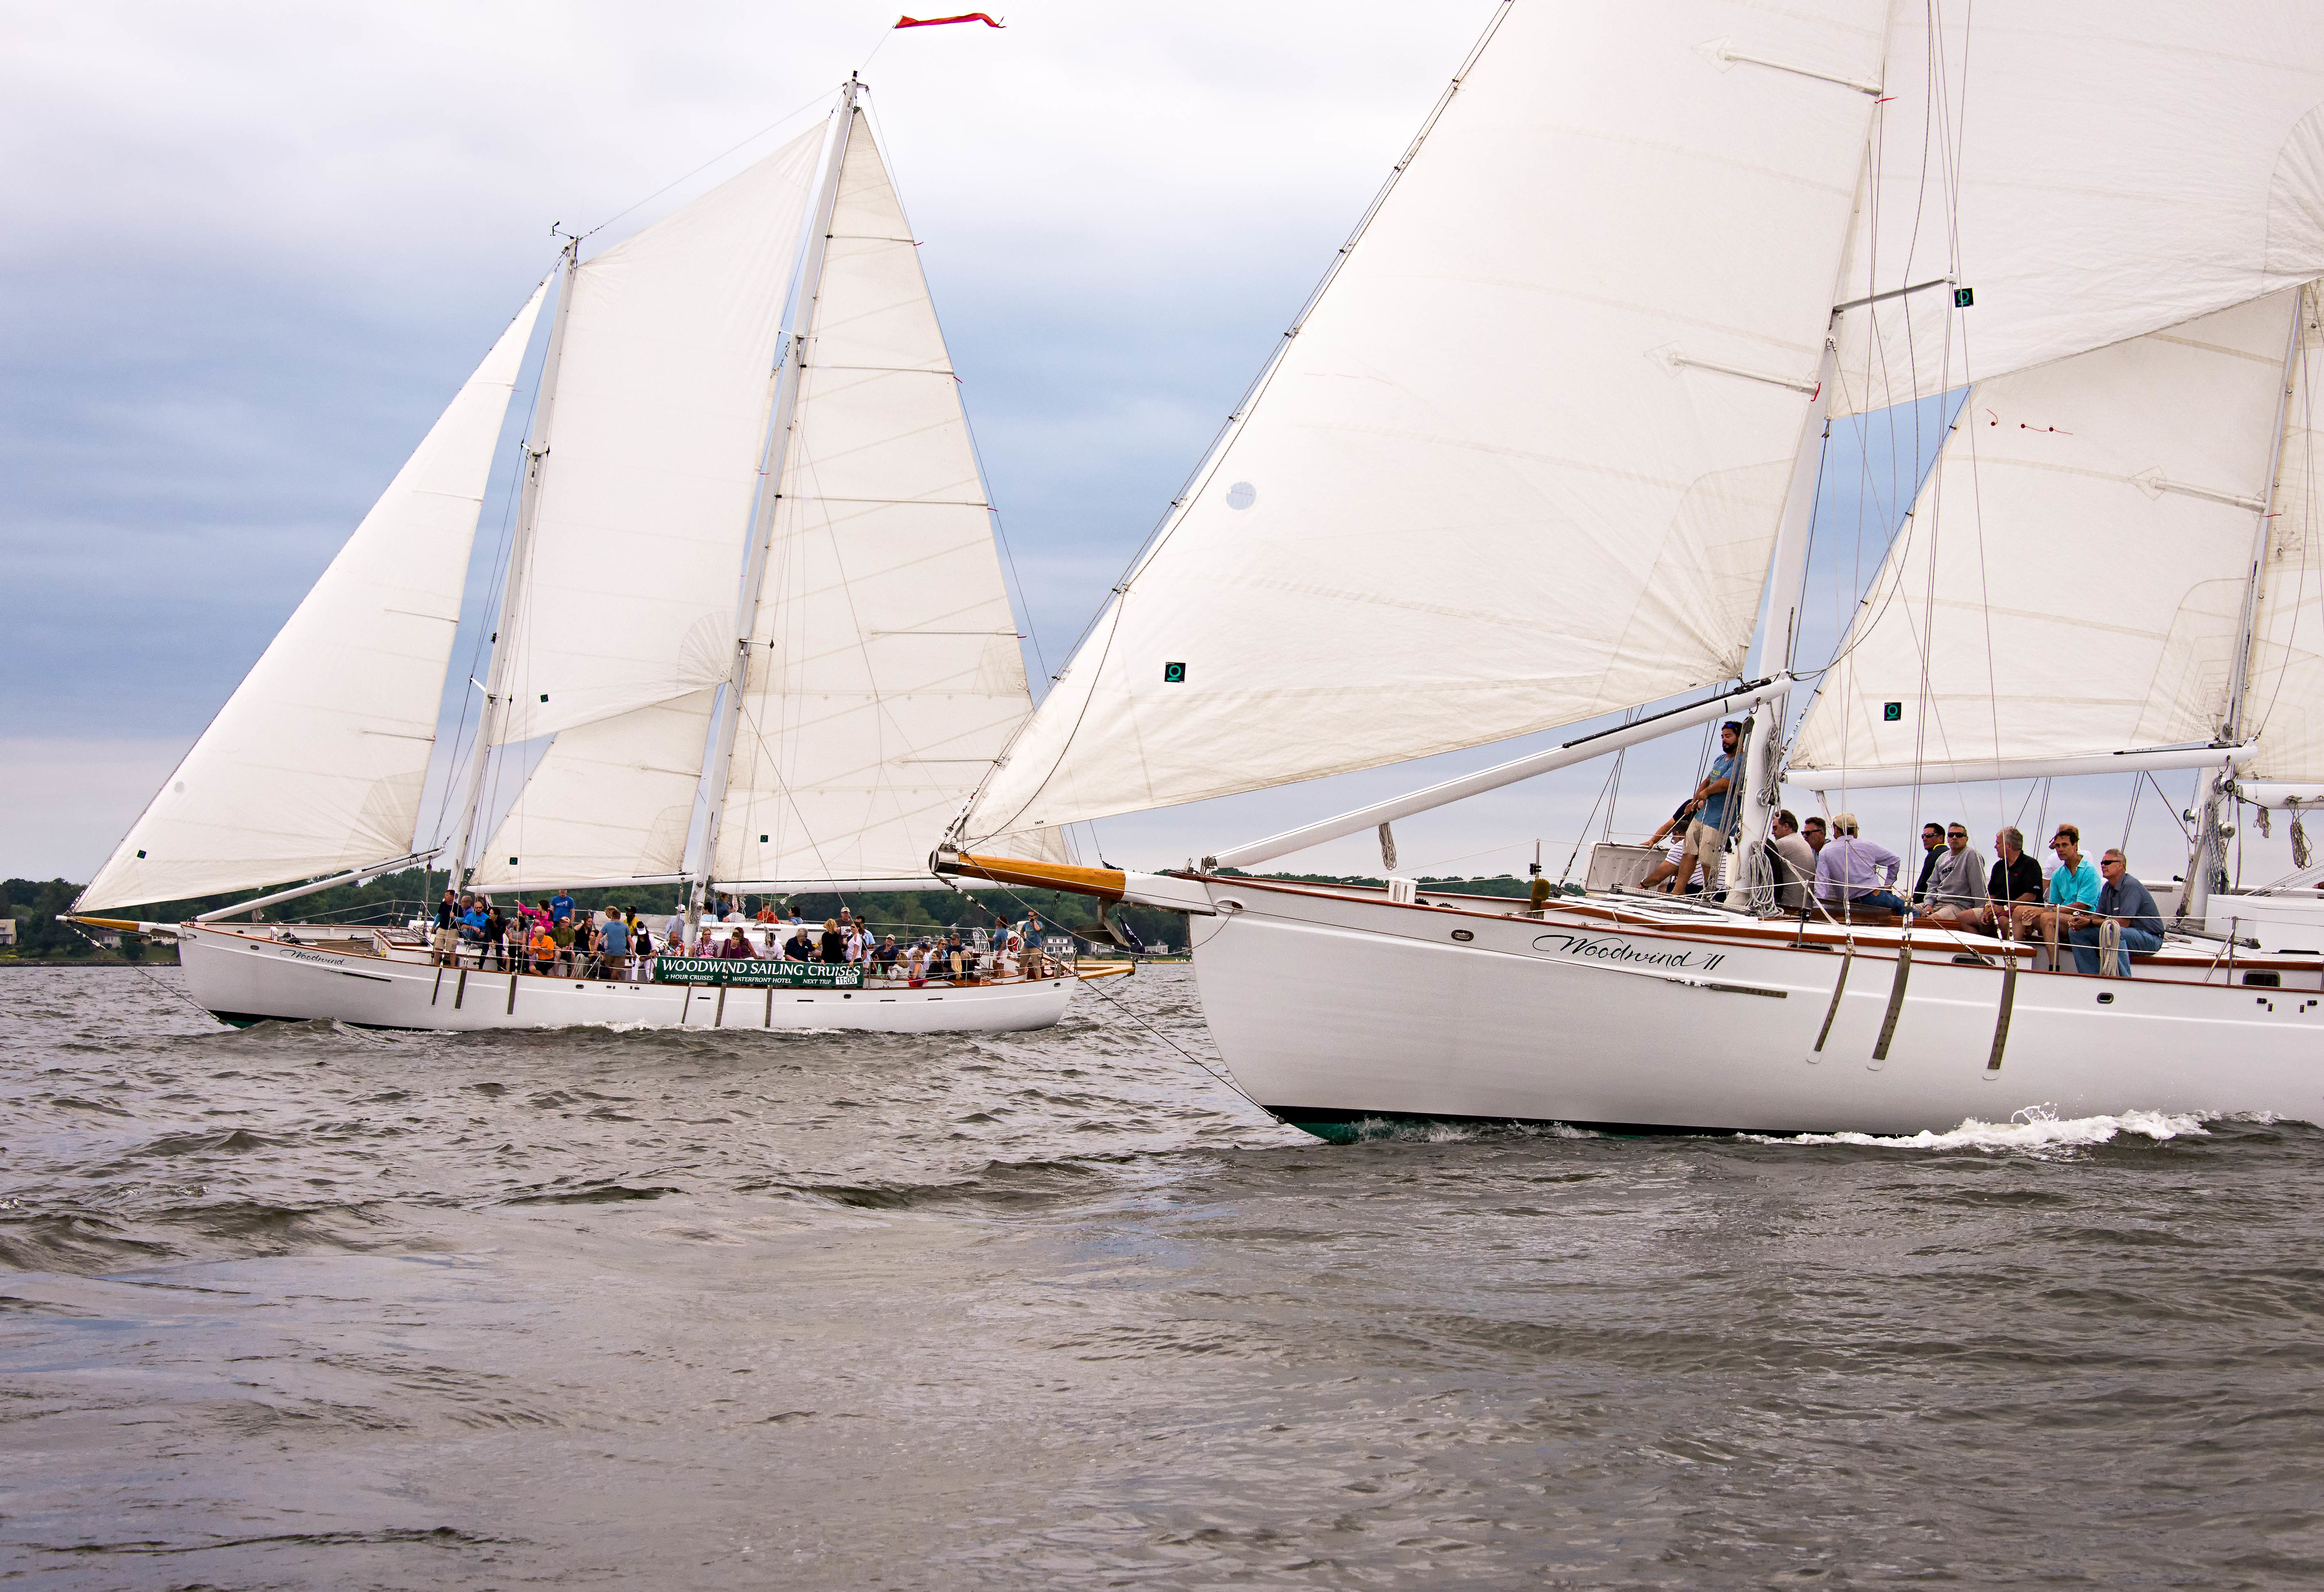 Classic Wooden Boat Regtta